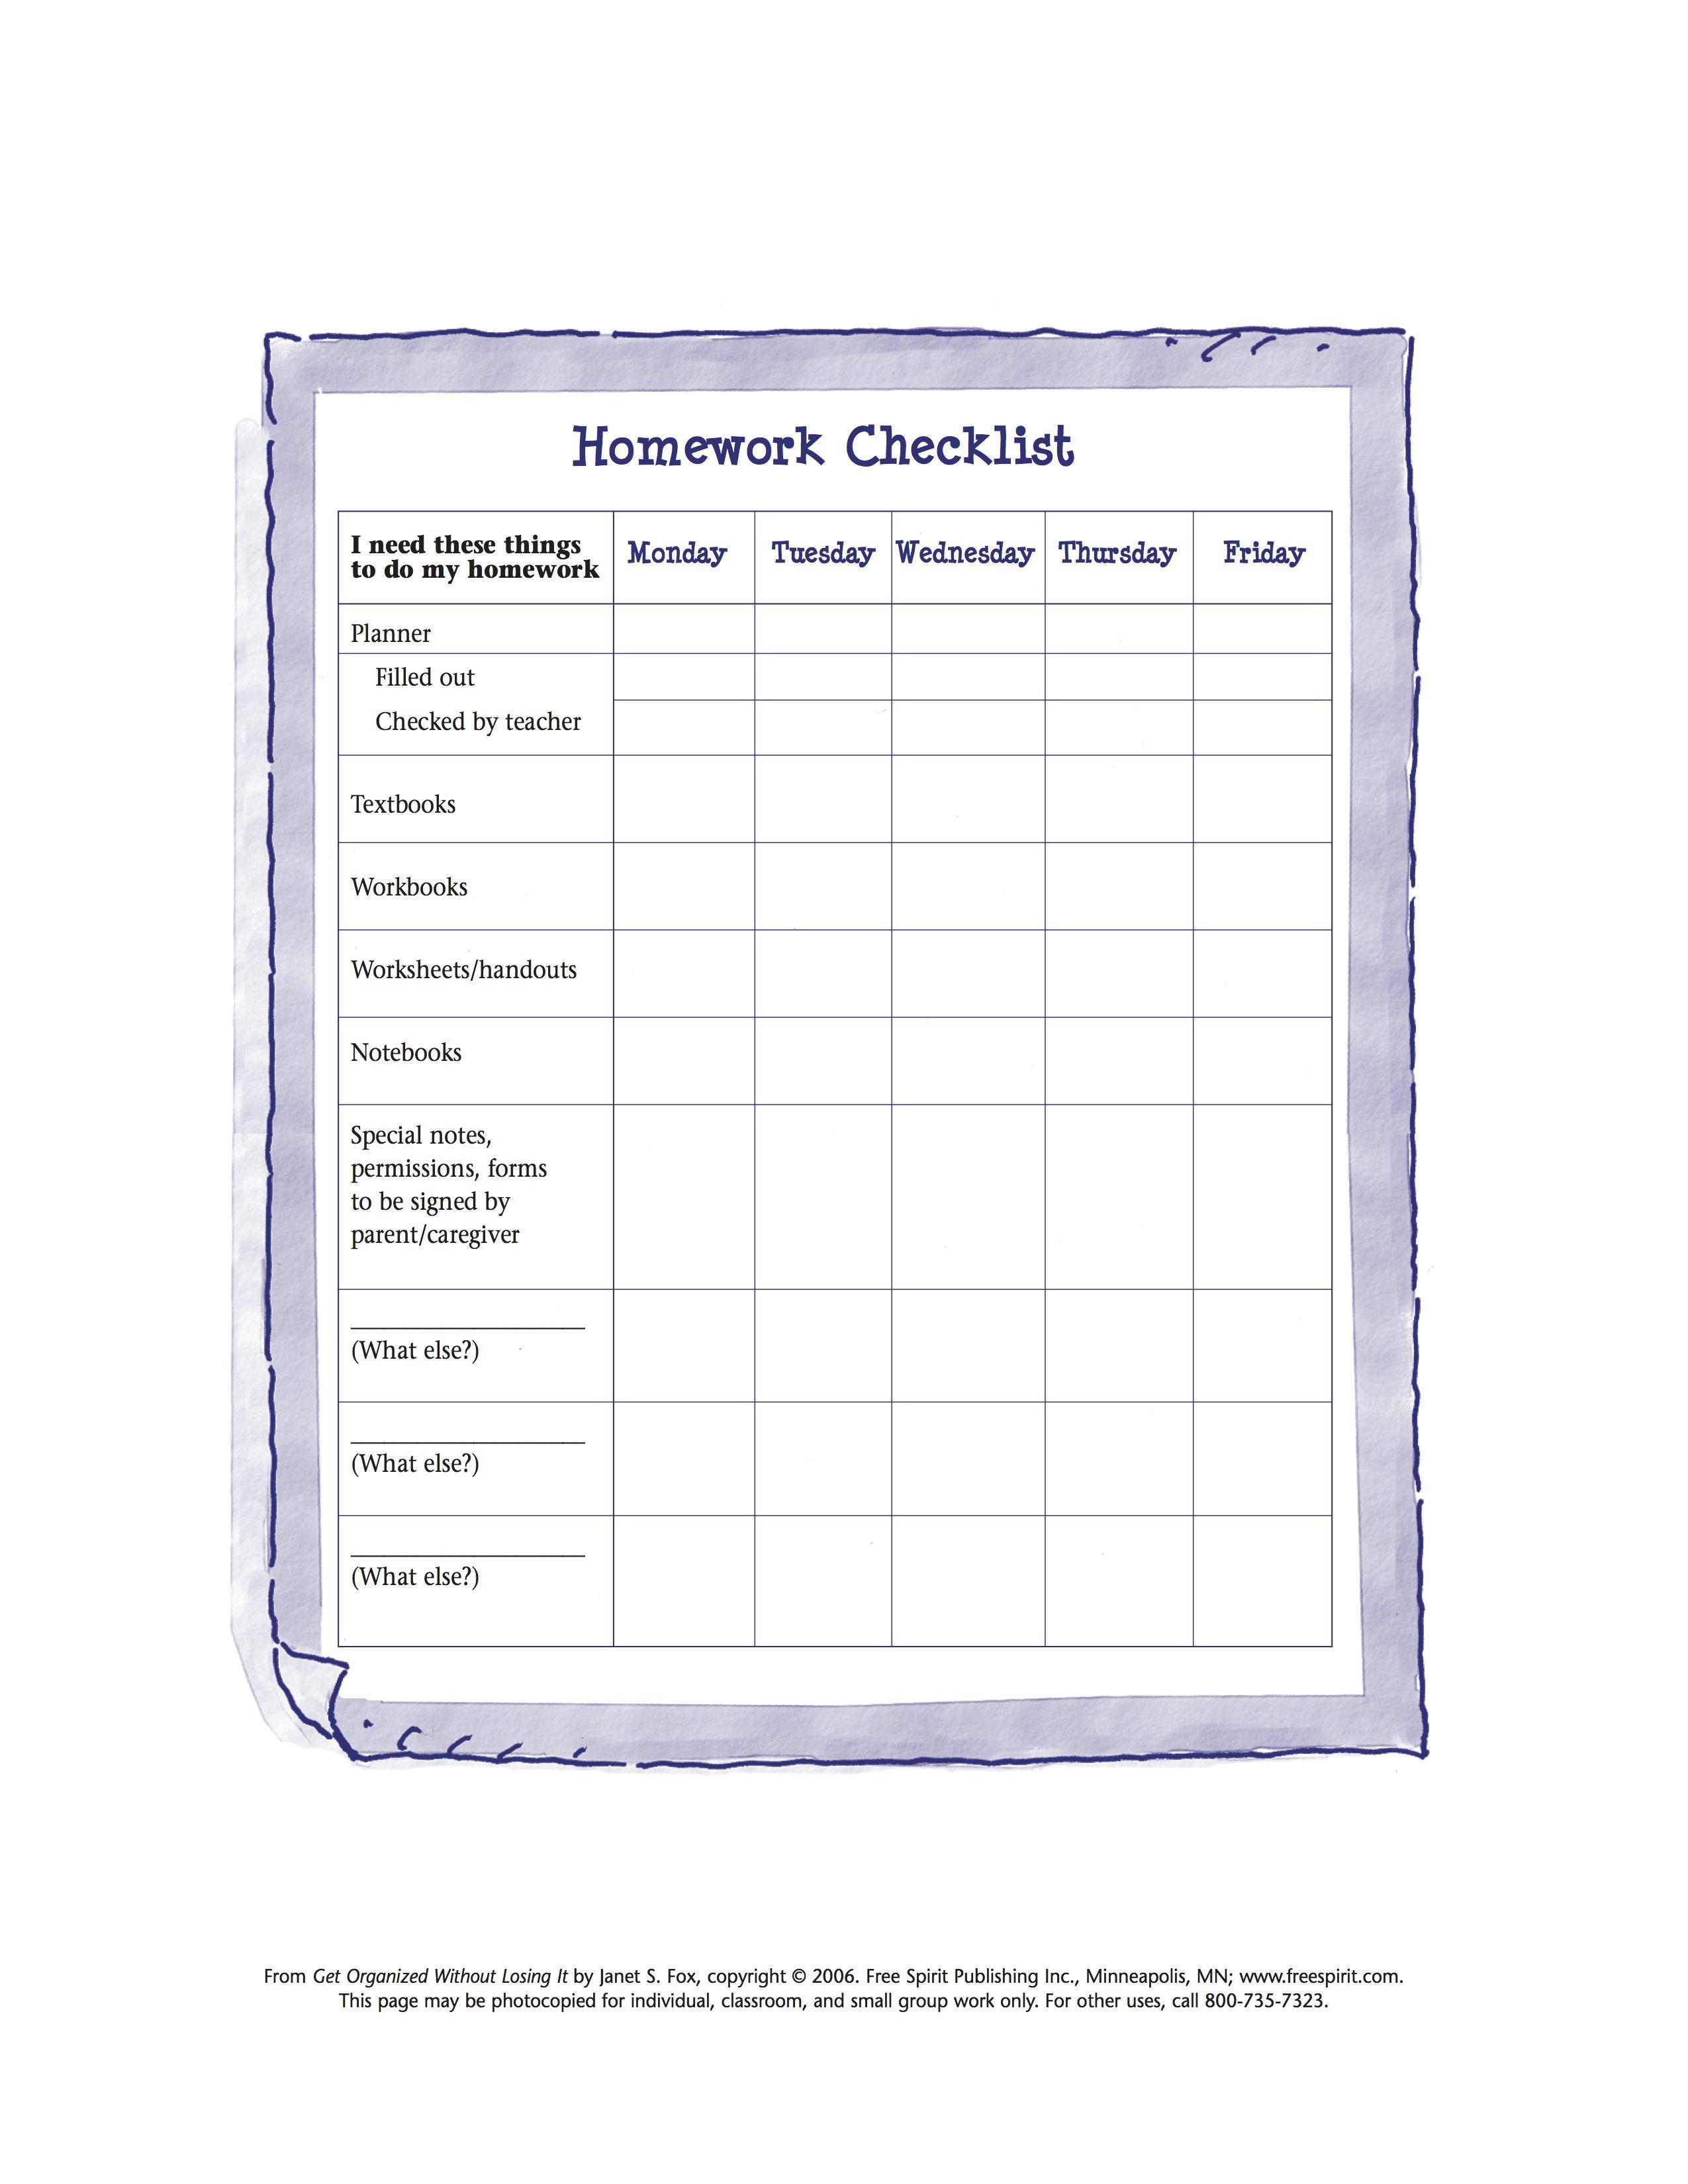 Free Printable Worksheet To Help Kids Organize Tools Needed For | Restorative Justice Printable Worksheets